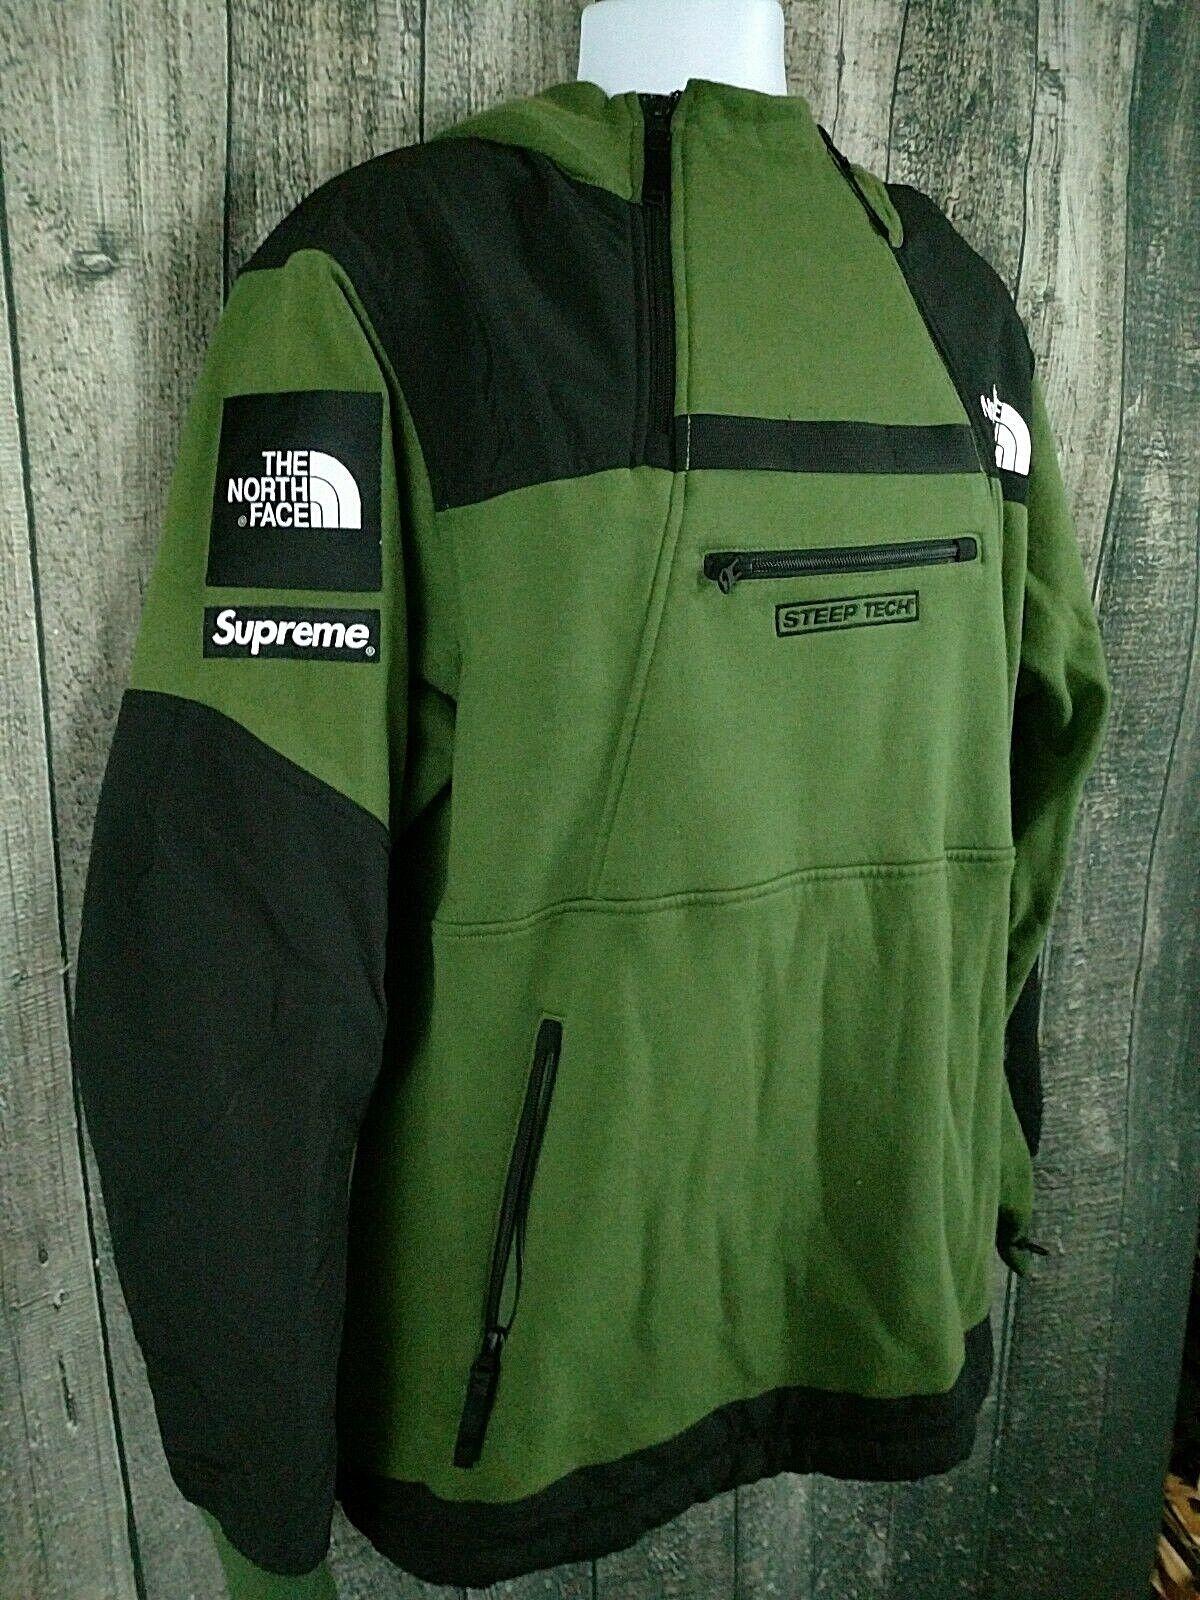 4e34723e2 Supreme X The North Face Steep Tech Hooded Sweatshirt Olive Green Sz XL